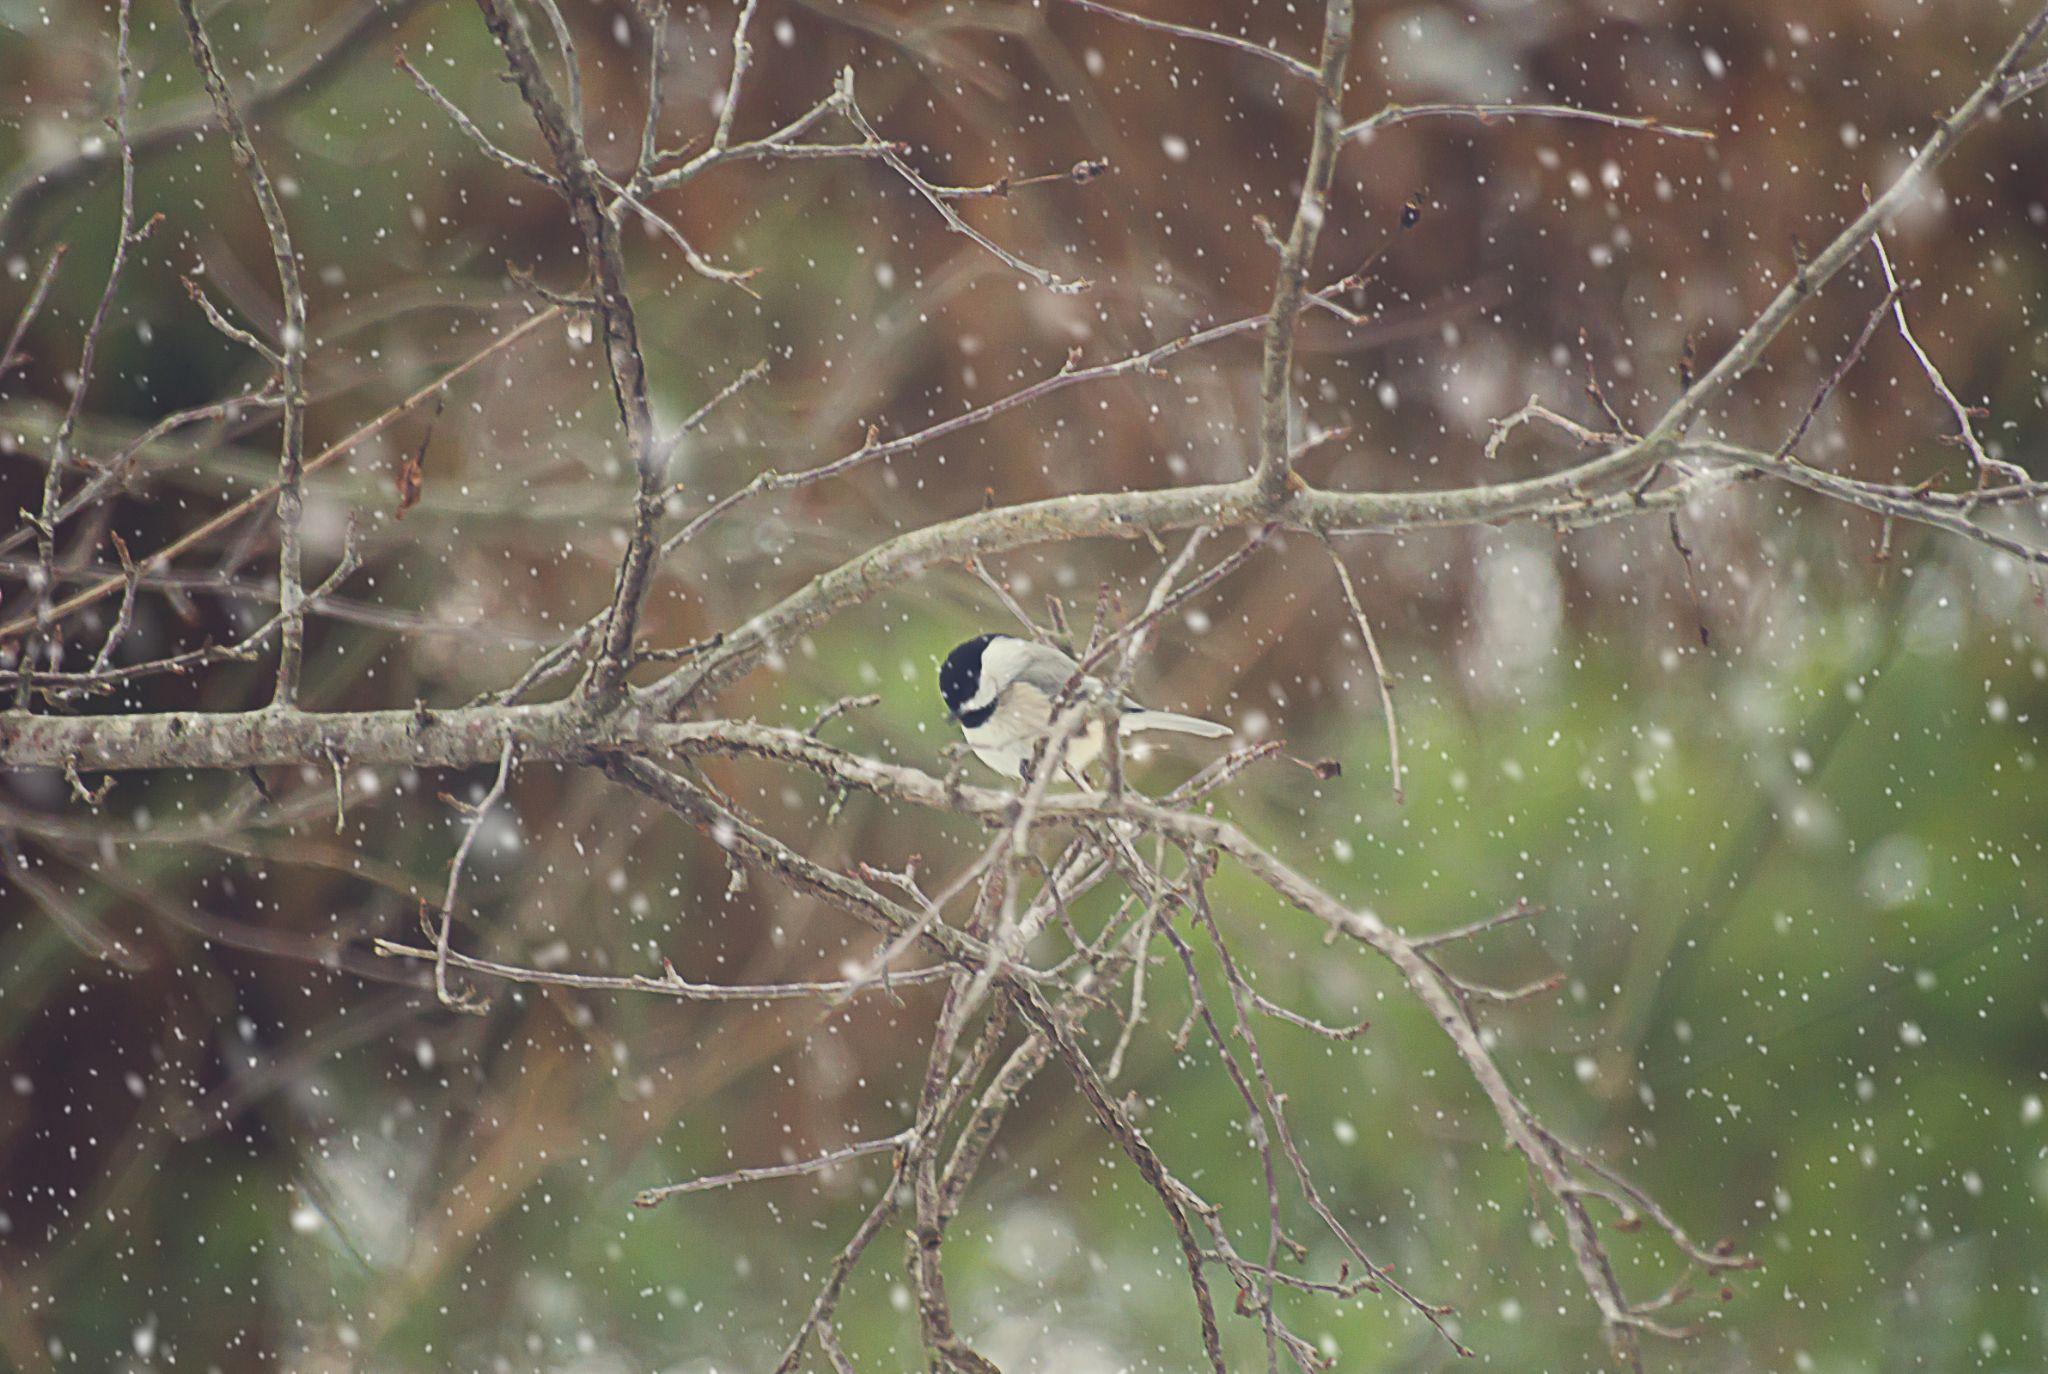 Snowy Chickadee by TeresaAnnSchmid